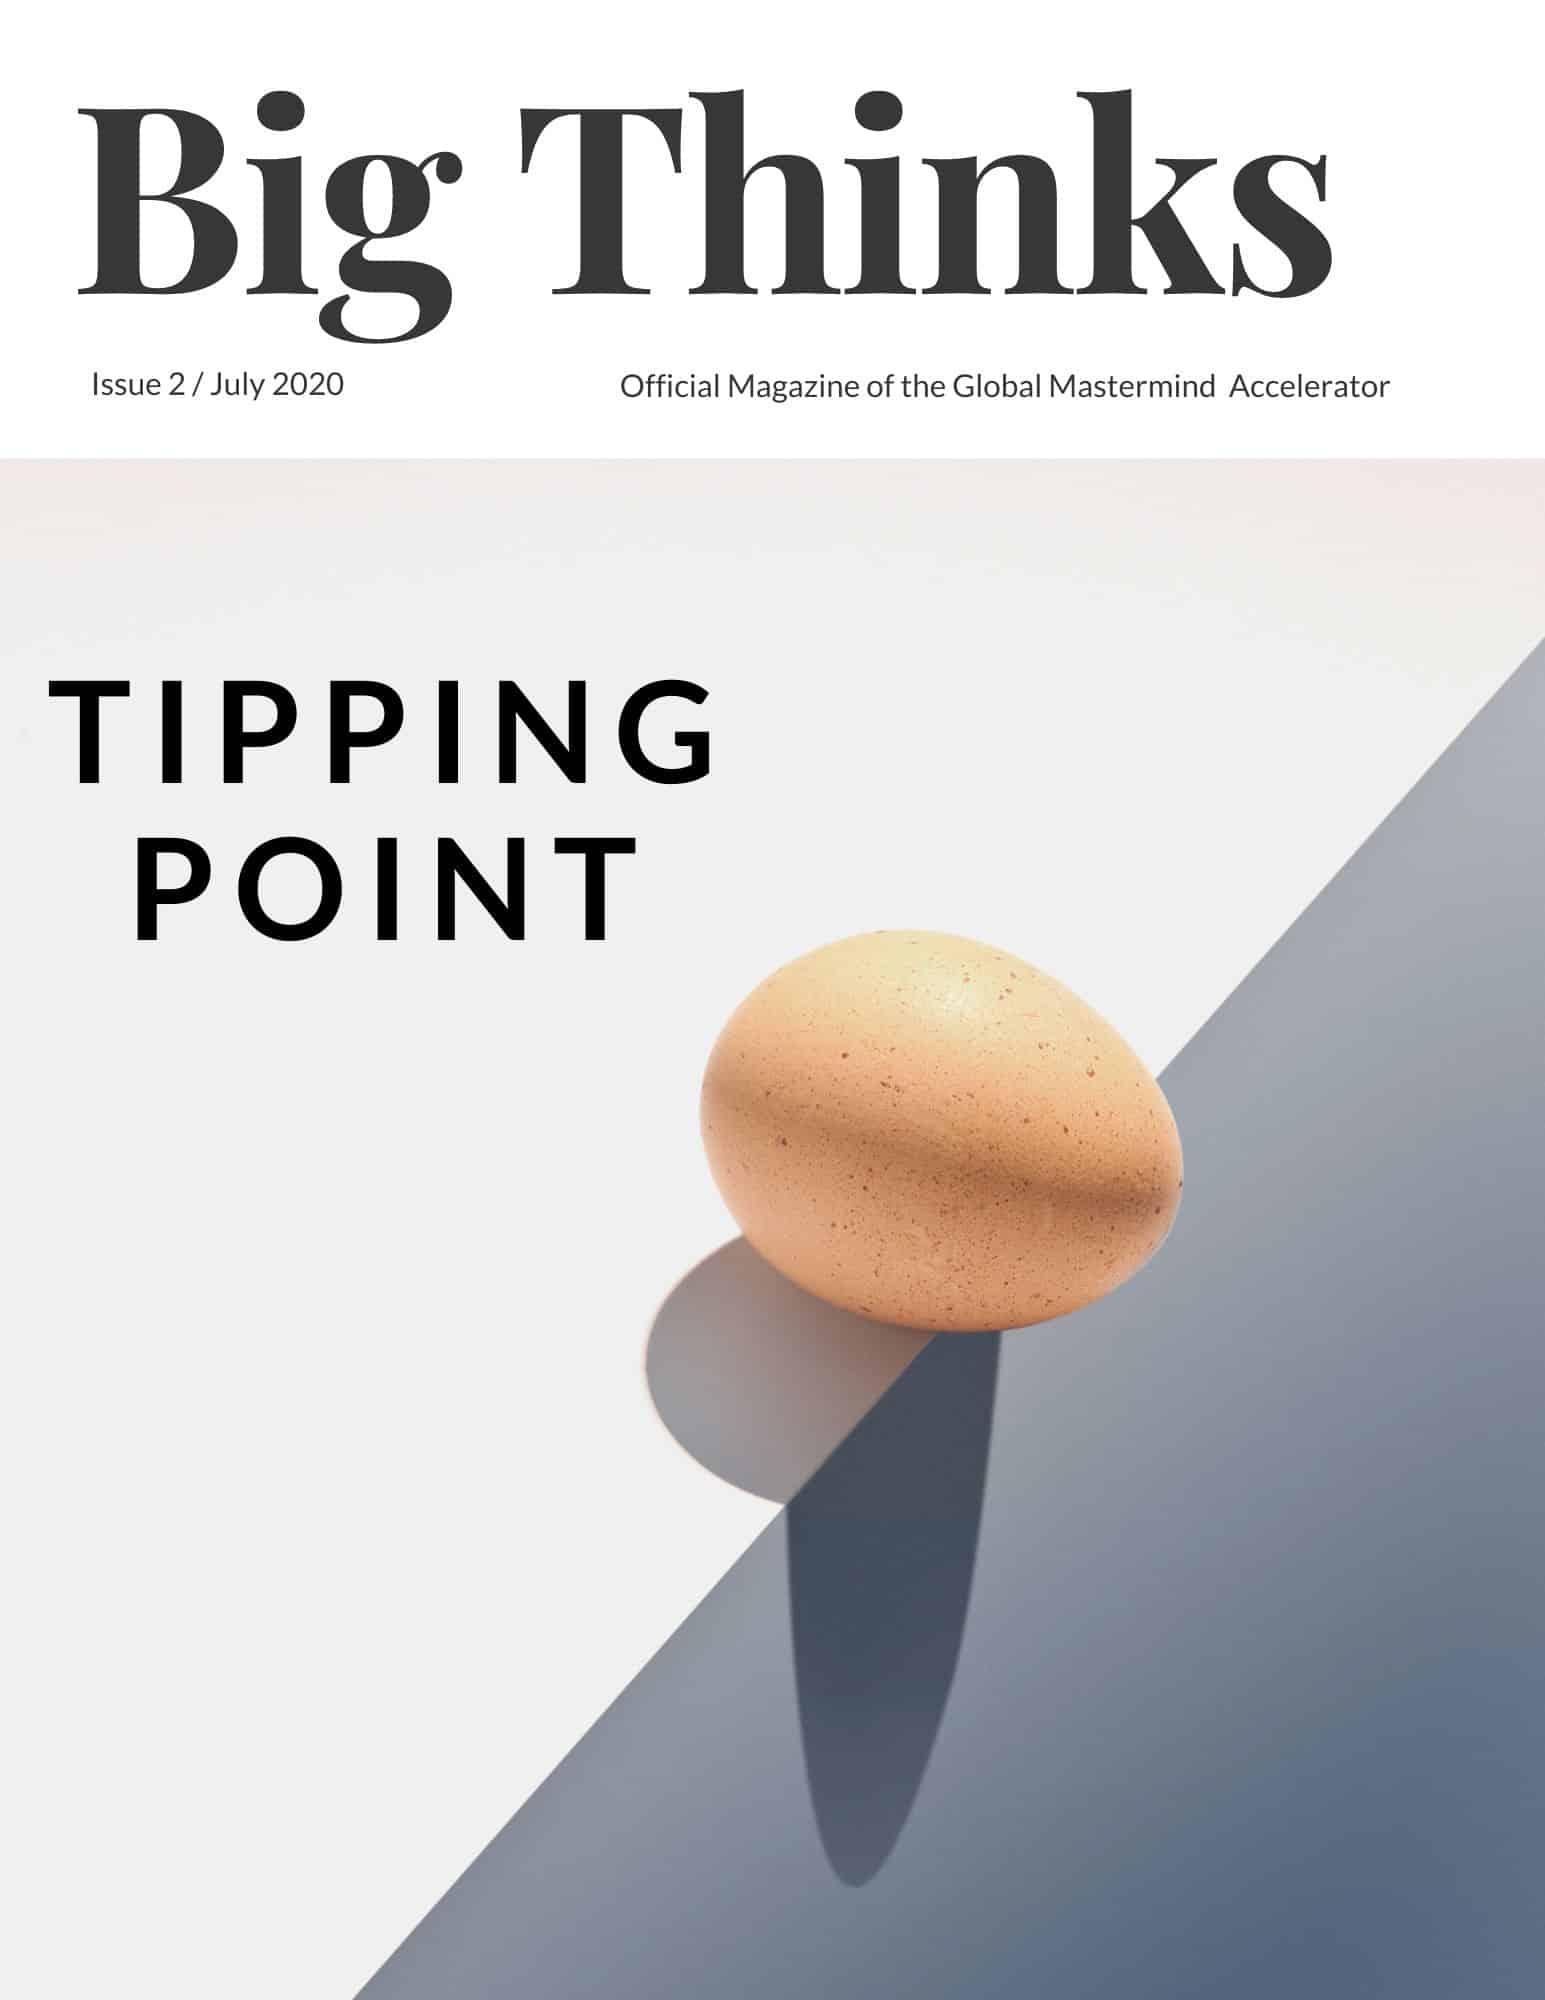 Big Thinks Magazine July 2020